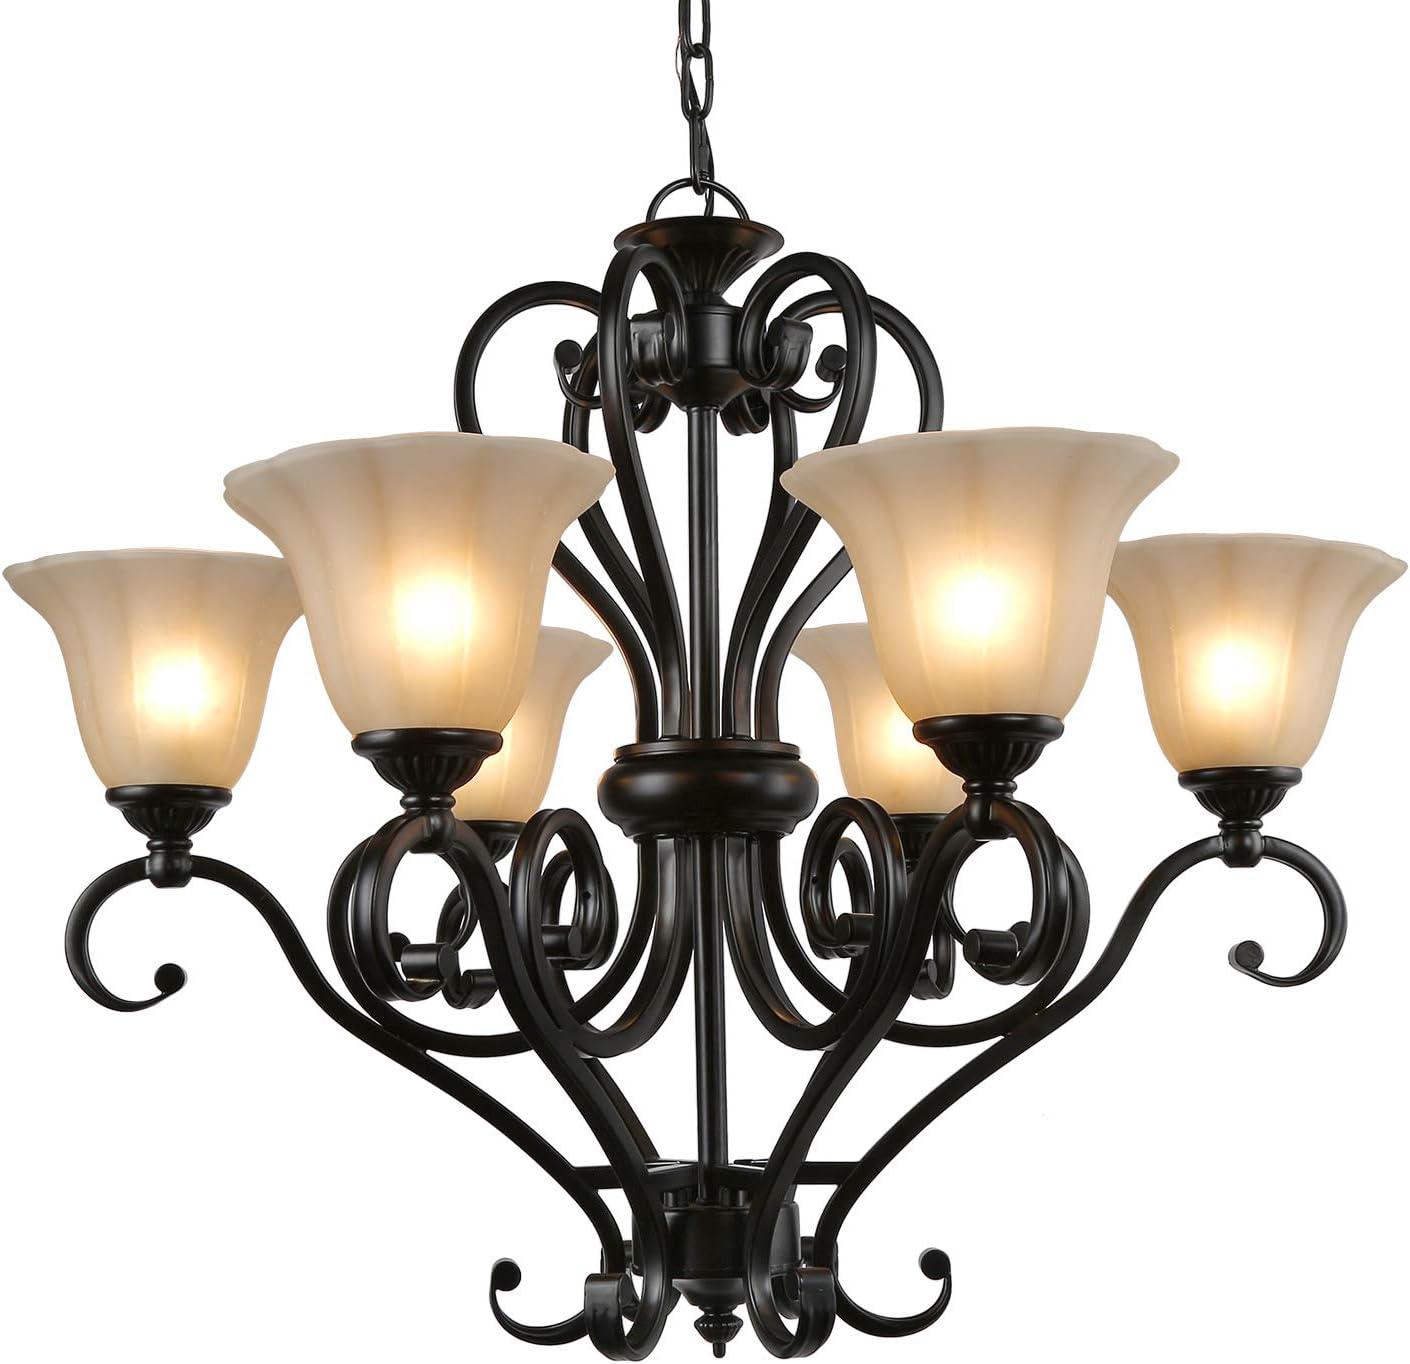 LNC 3 light Chandeliers, Antique Chandelier Lighting, Black